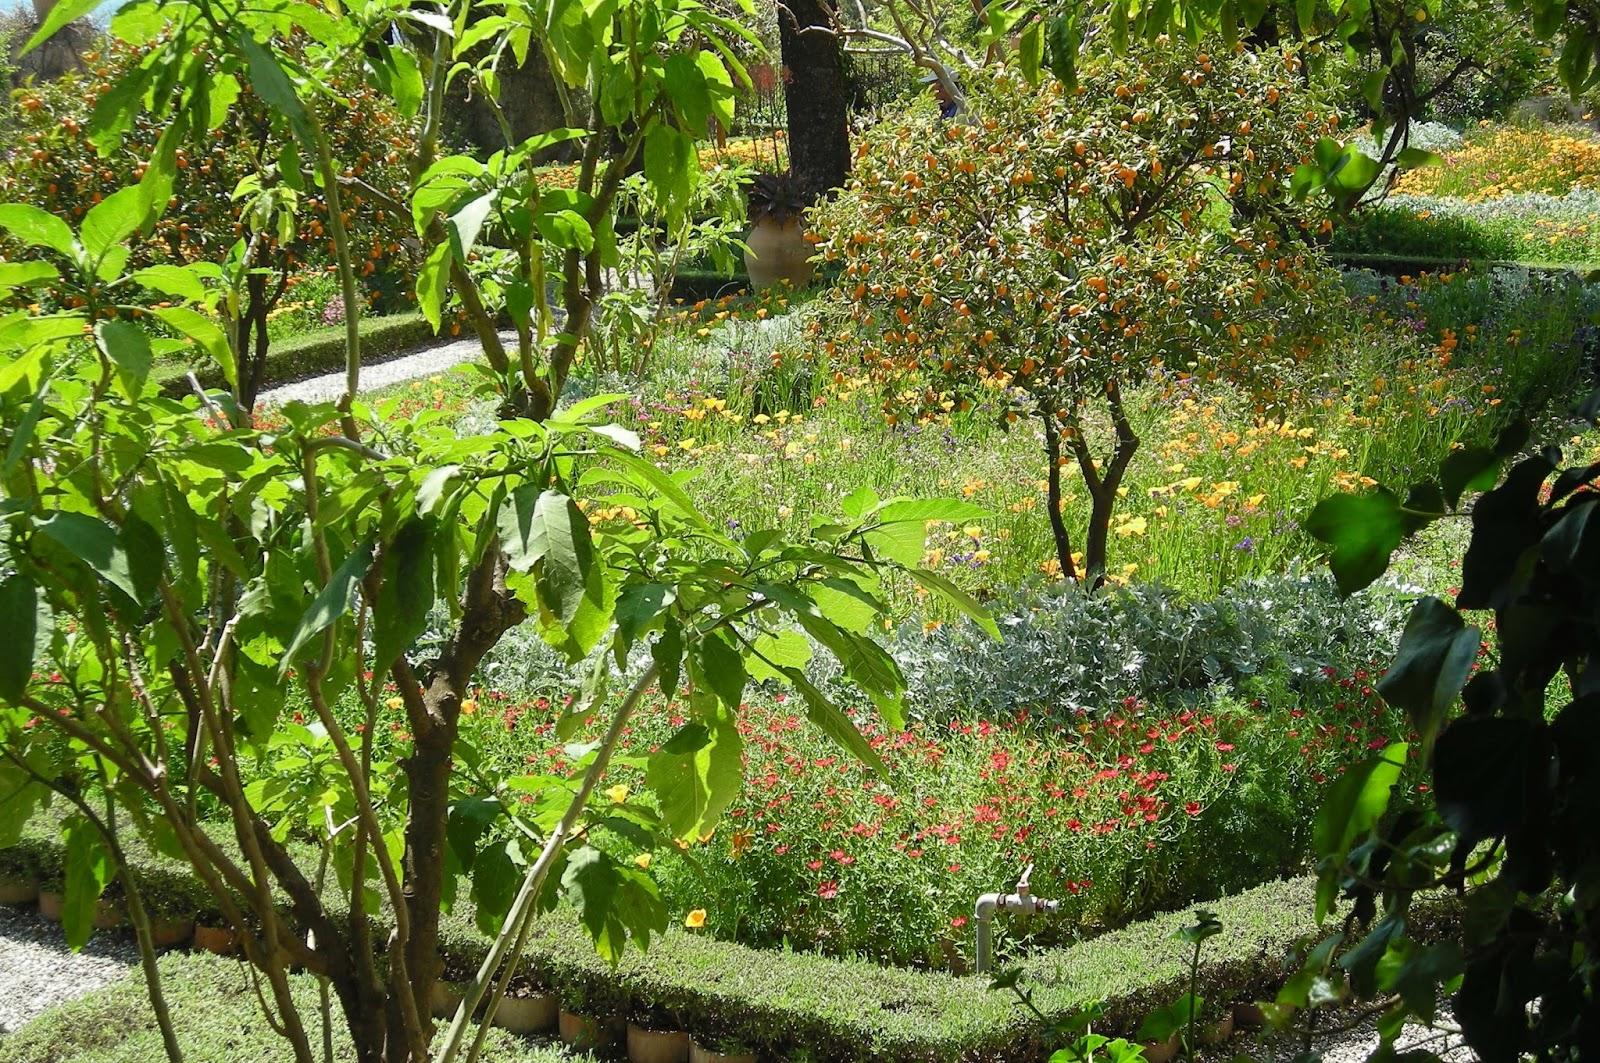 hortibus du 13 au 17 avril 2015 voyage palais et jardins prives de sicile orientale. Black Bedroom Furniture Sets. Home Design Ideas